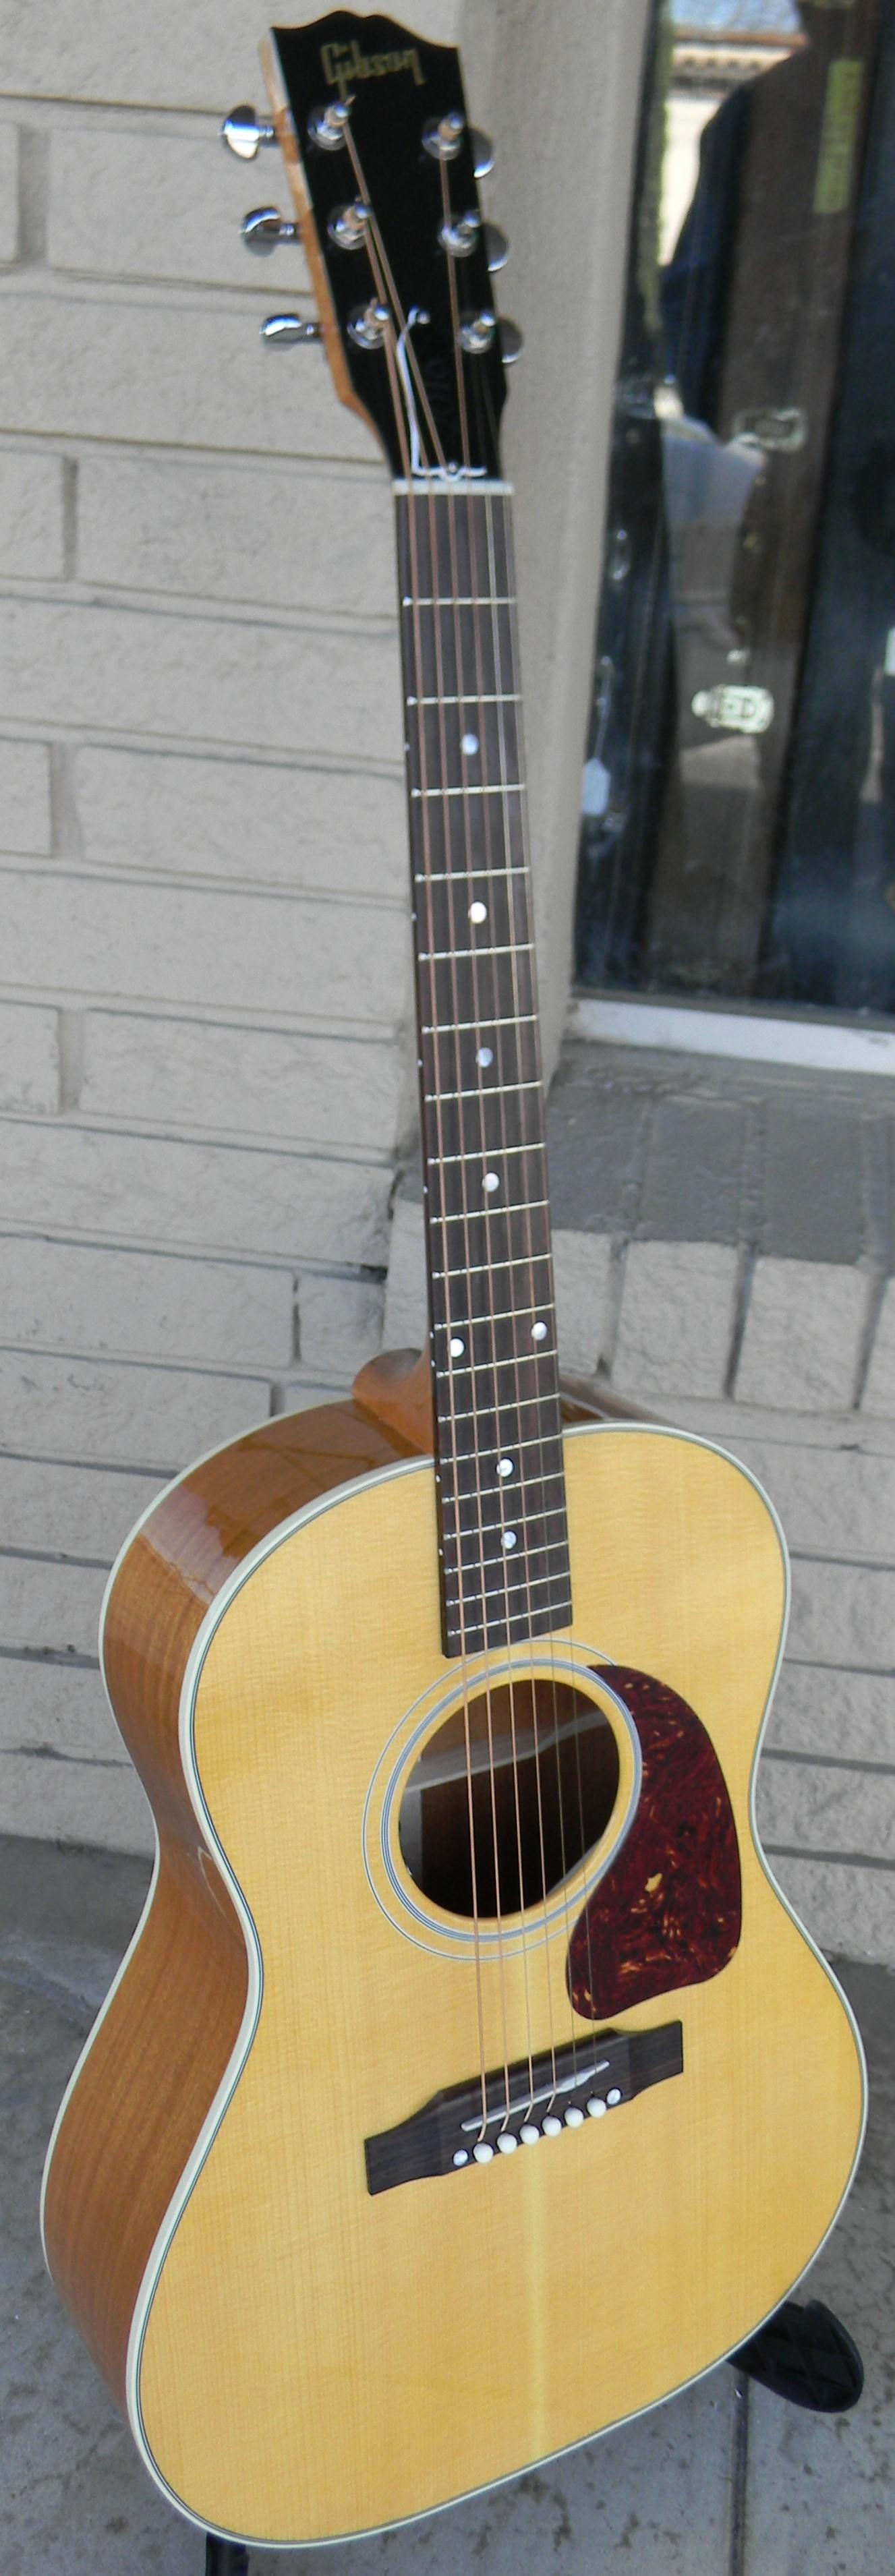 dscn1367 san antonio guitar store guitar tex. Black Bedroom Furniture Sets. Home Design Ideas